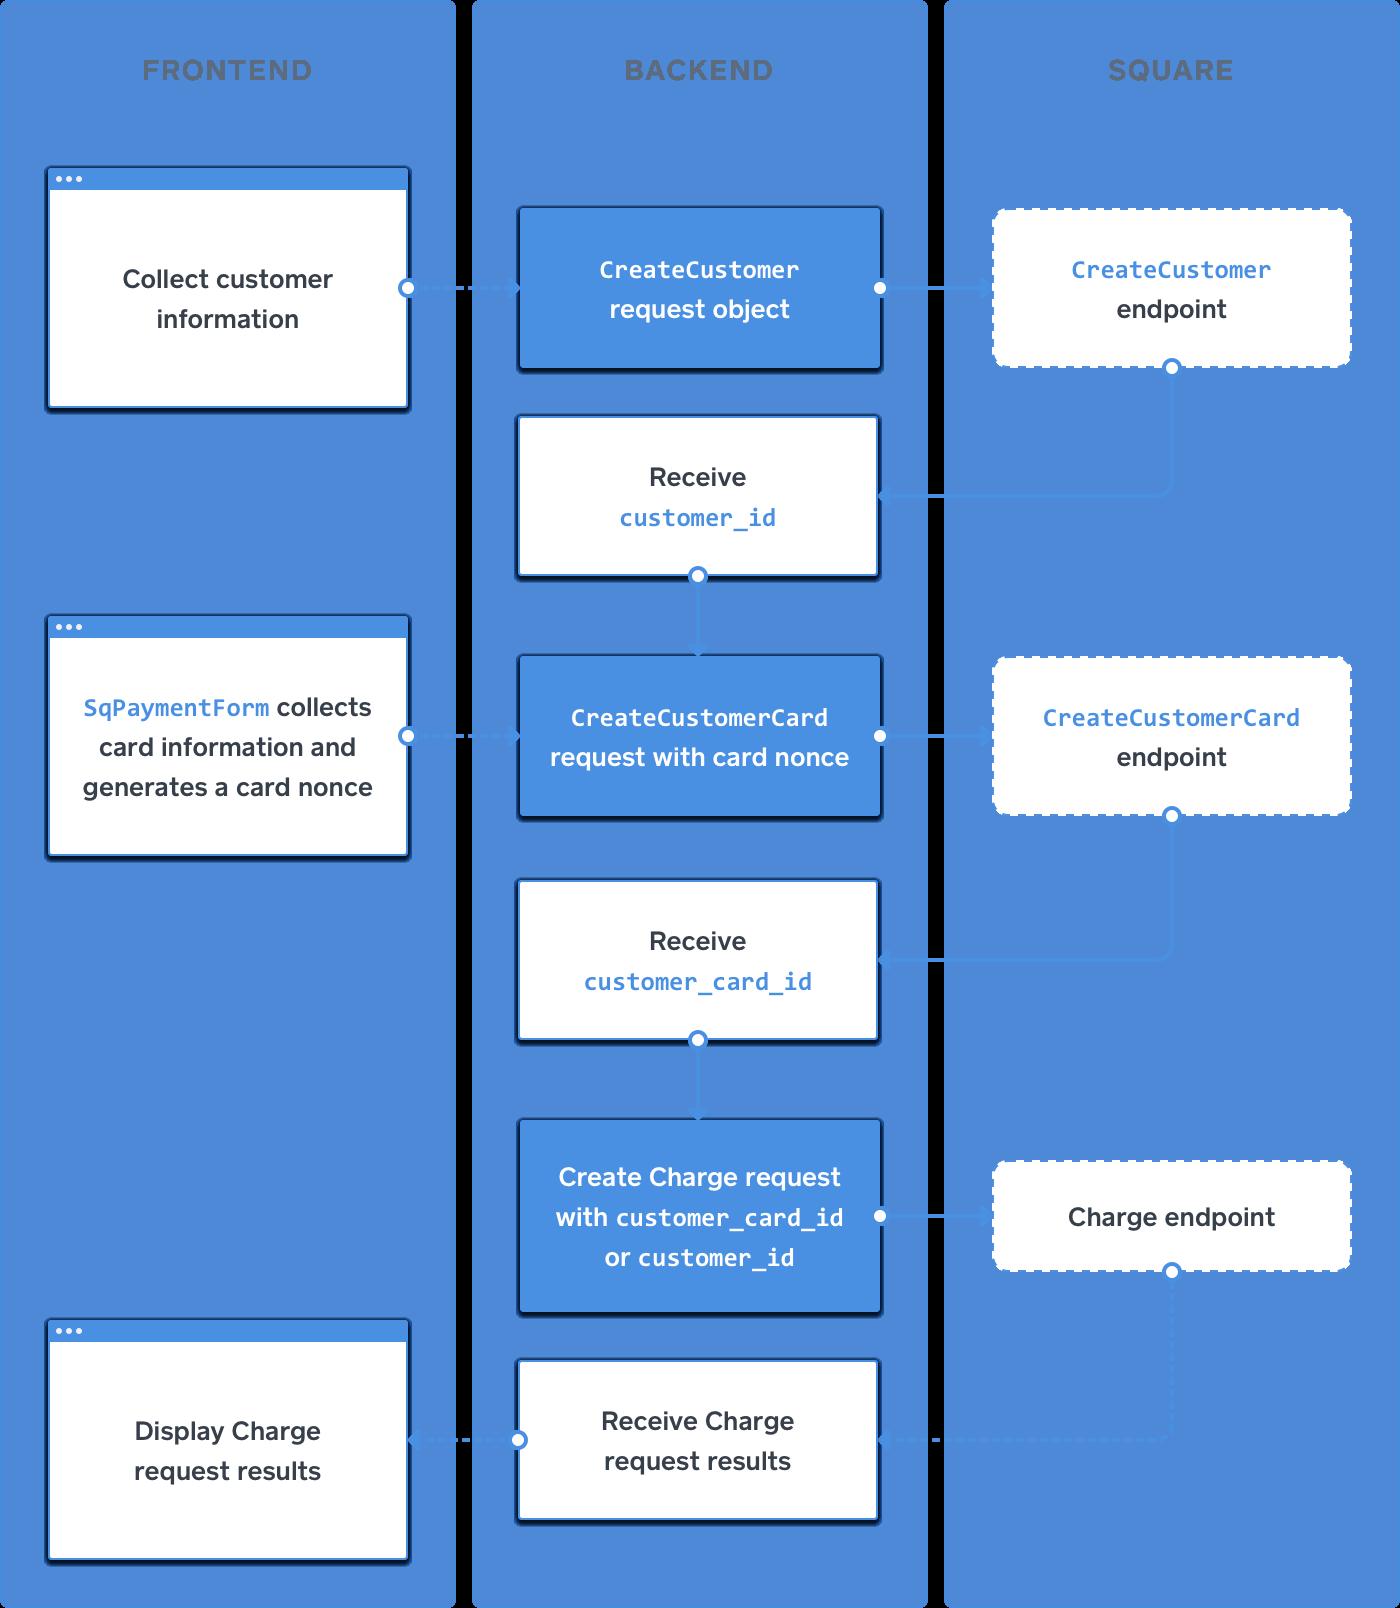 Process flow 2